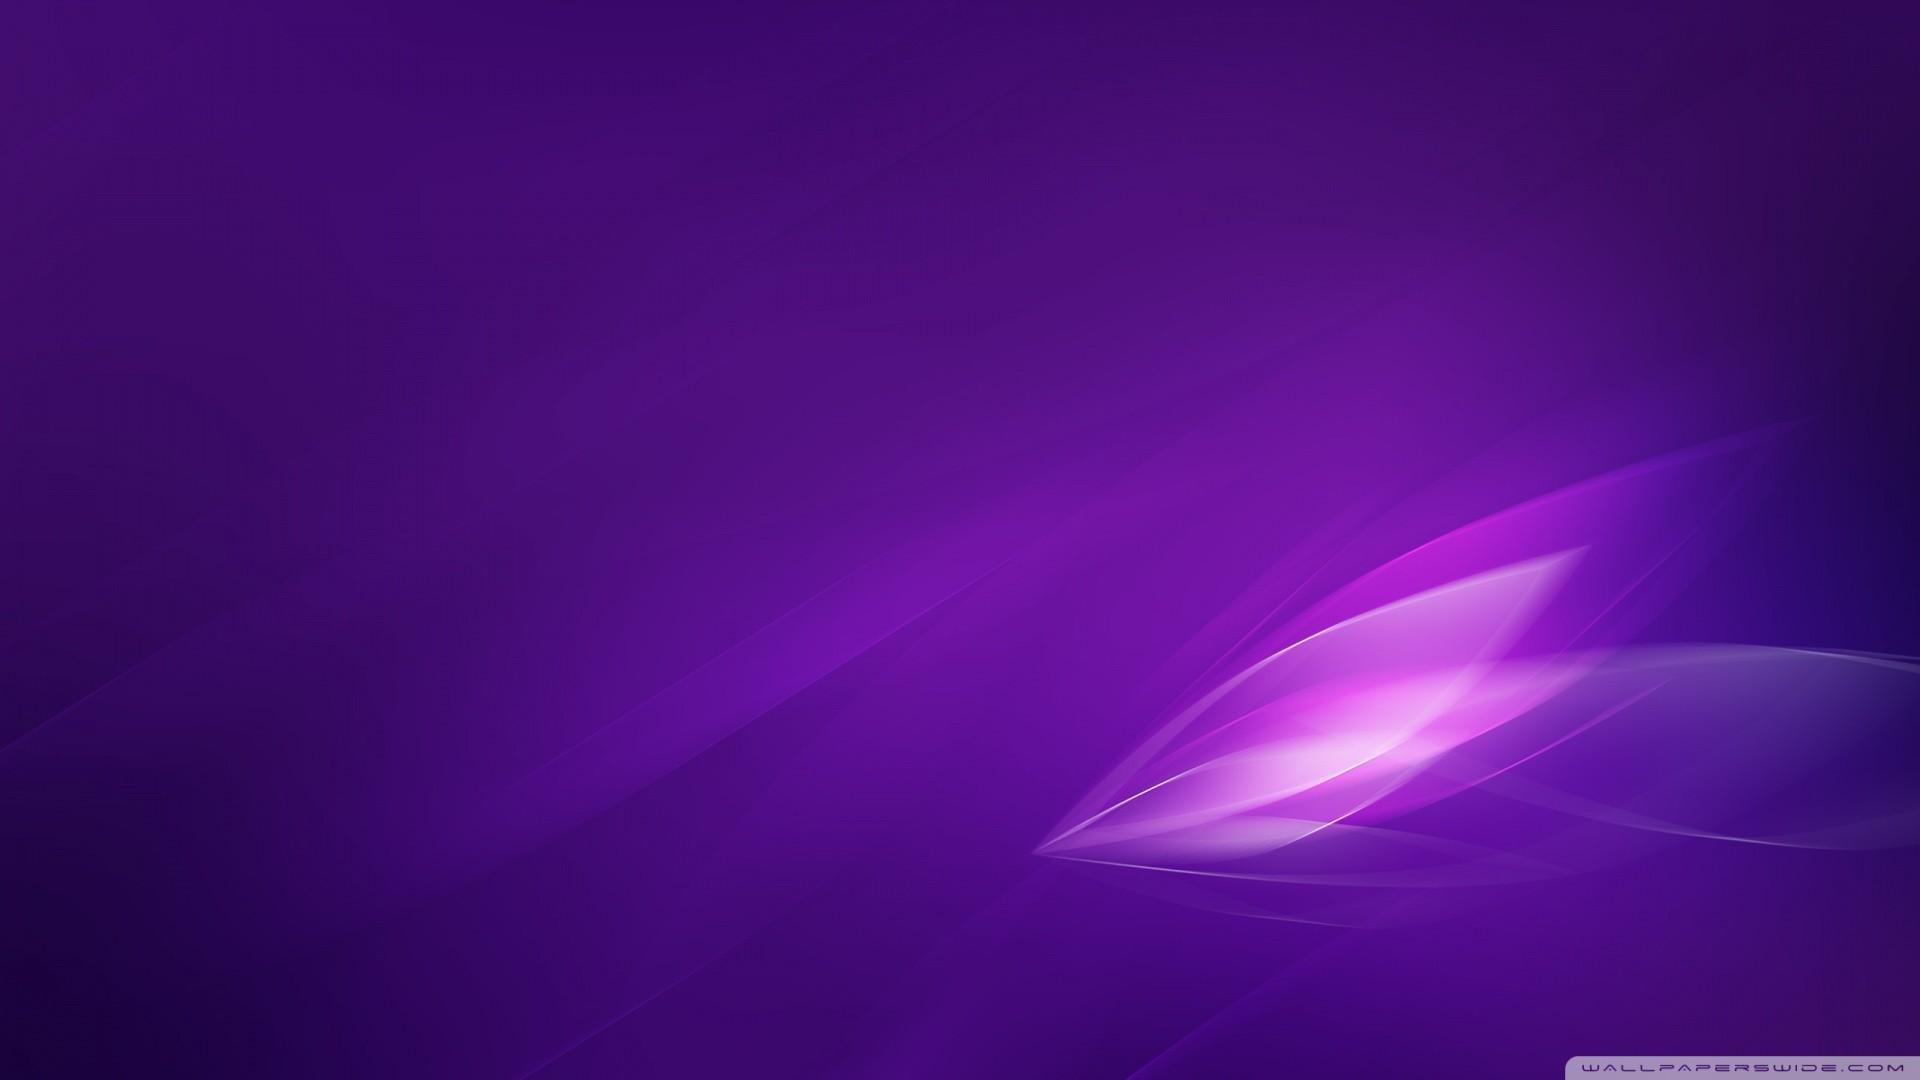 Dark Purple Background Wallpaper 61 Images